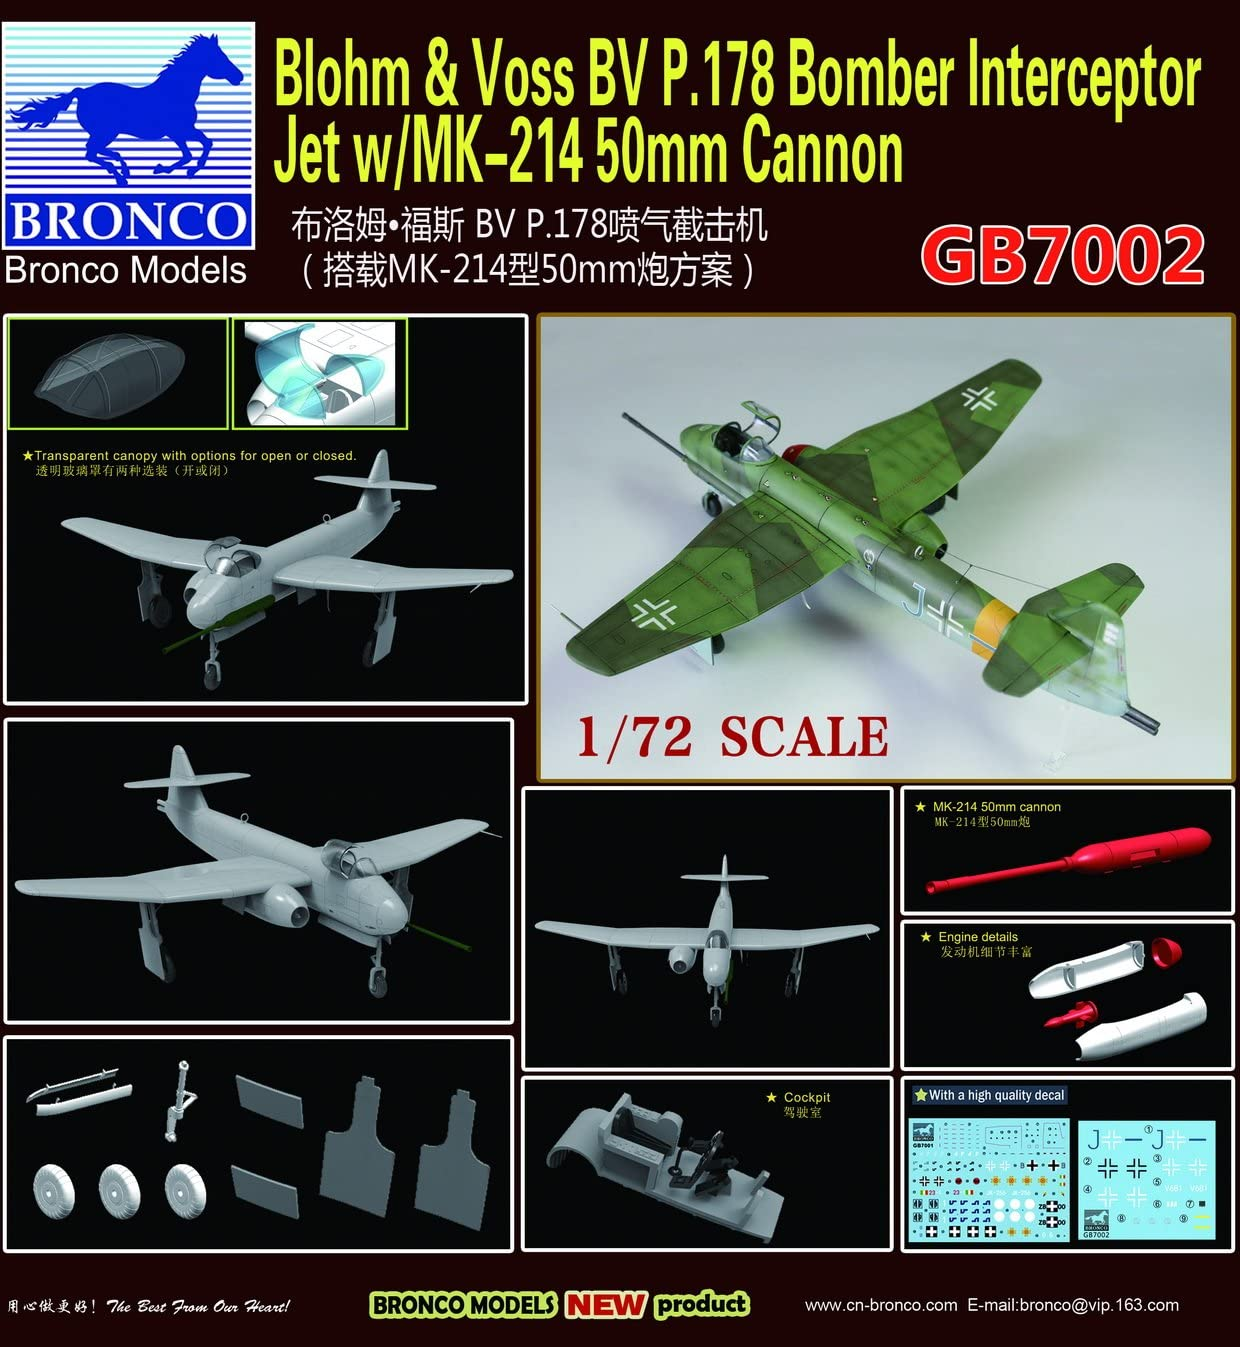 Voss BV P.178 Bomber Interceptor Jet w//MK-214 50mm Bronco Models GB7002 Blohm u